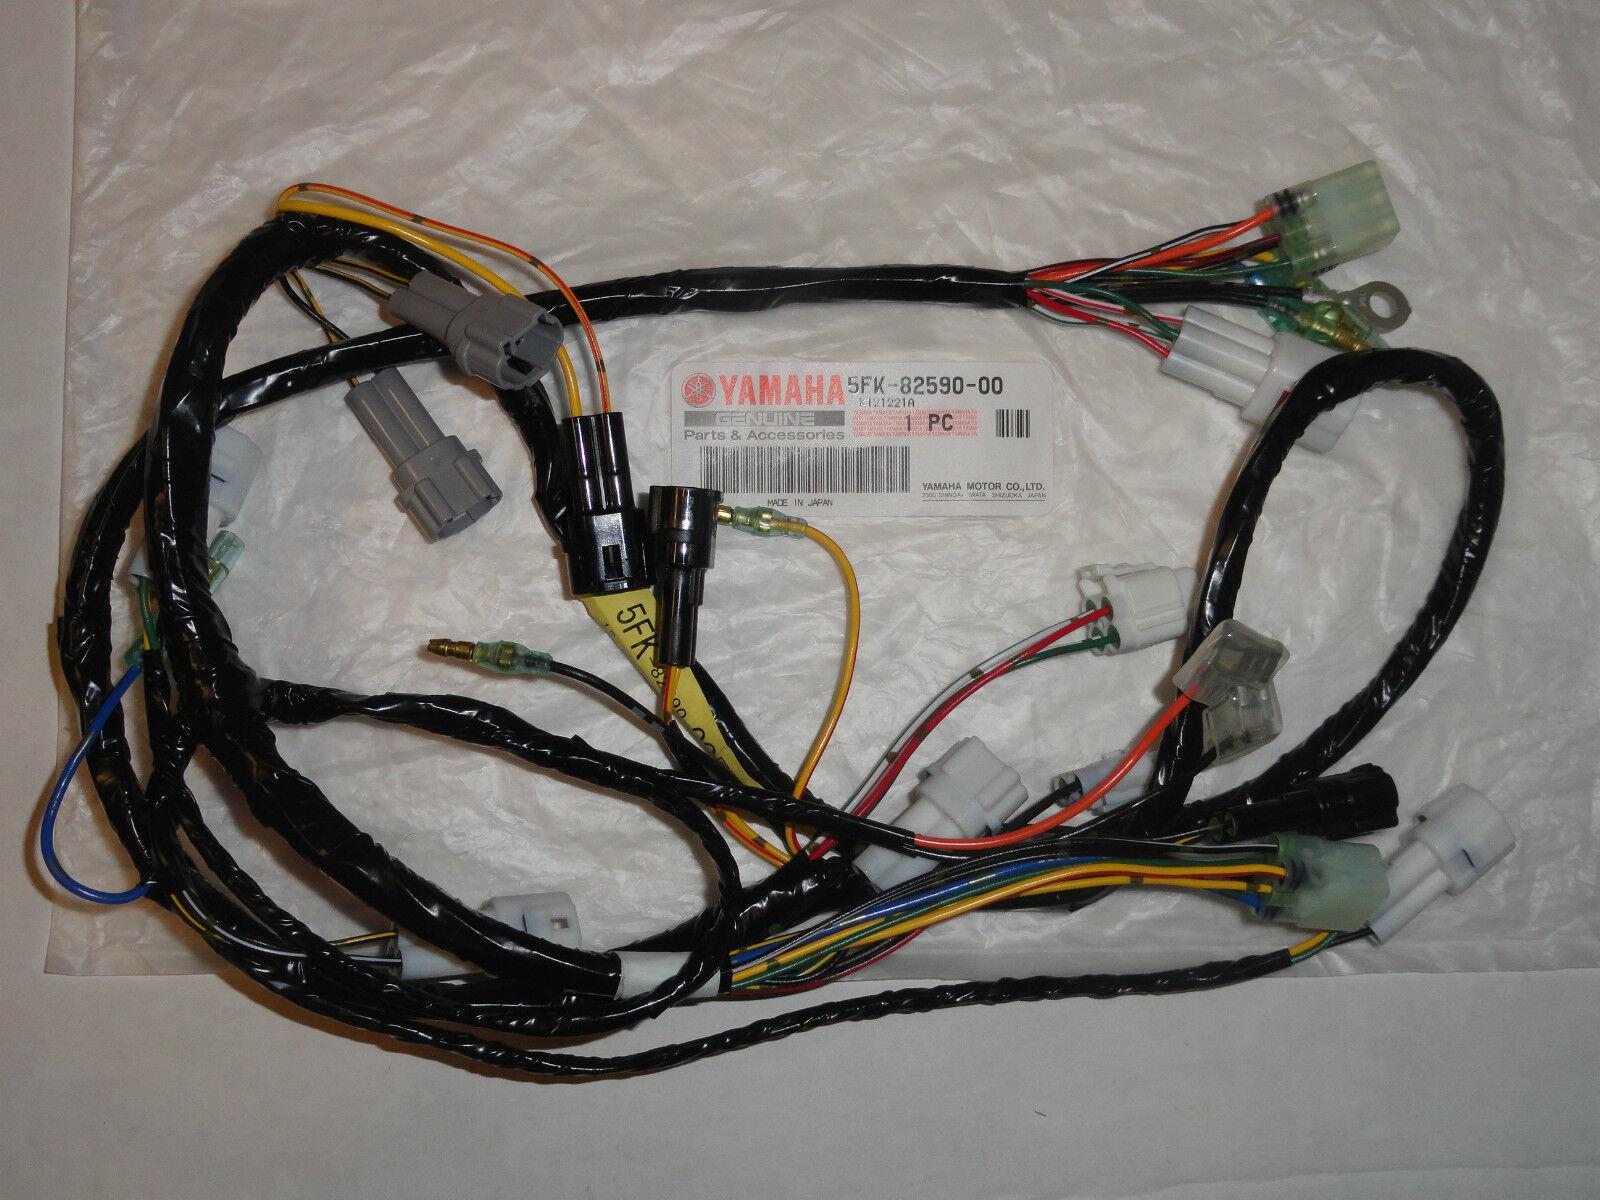 hight resolution of yamaha banshee wiring harness routing yamaha image banshee coil wiring banshee image wiring diagram on yamaha